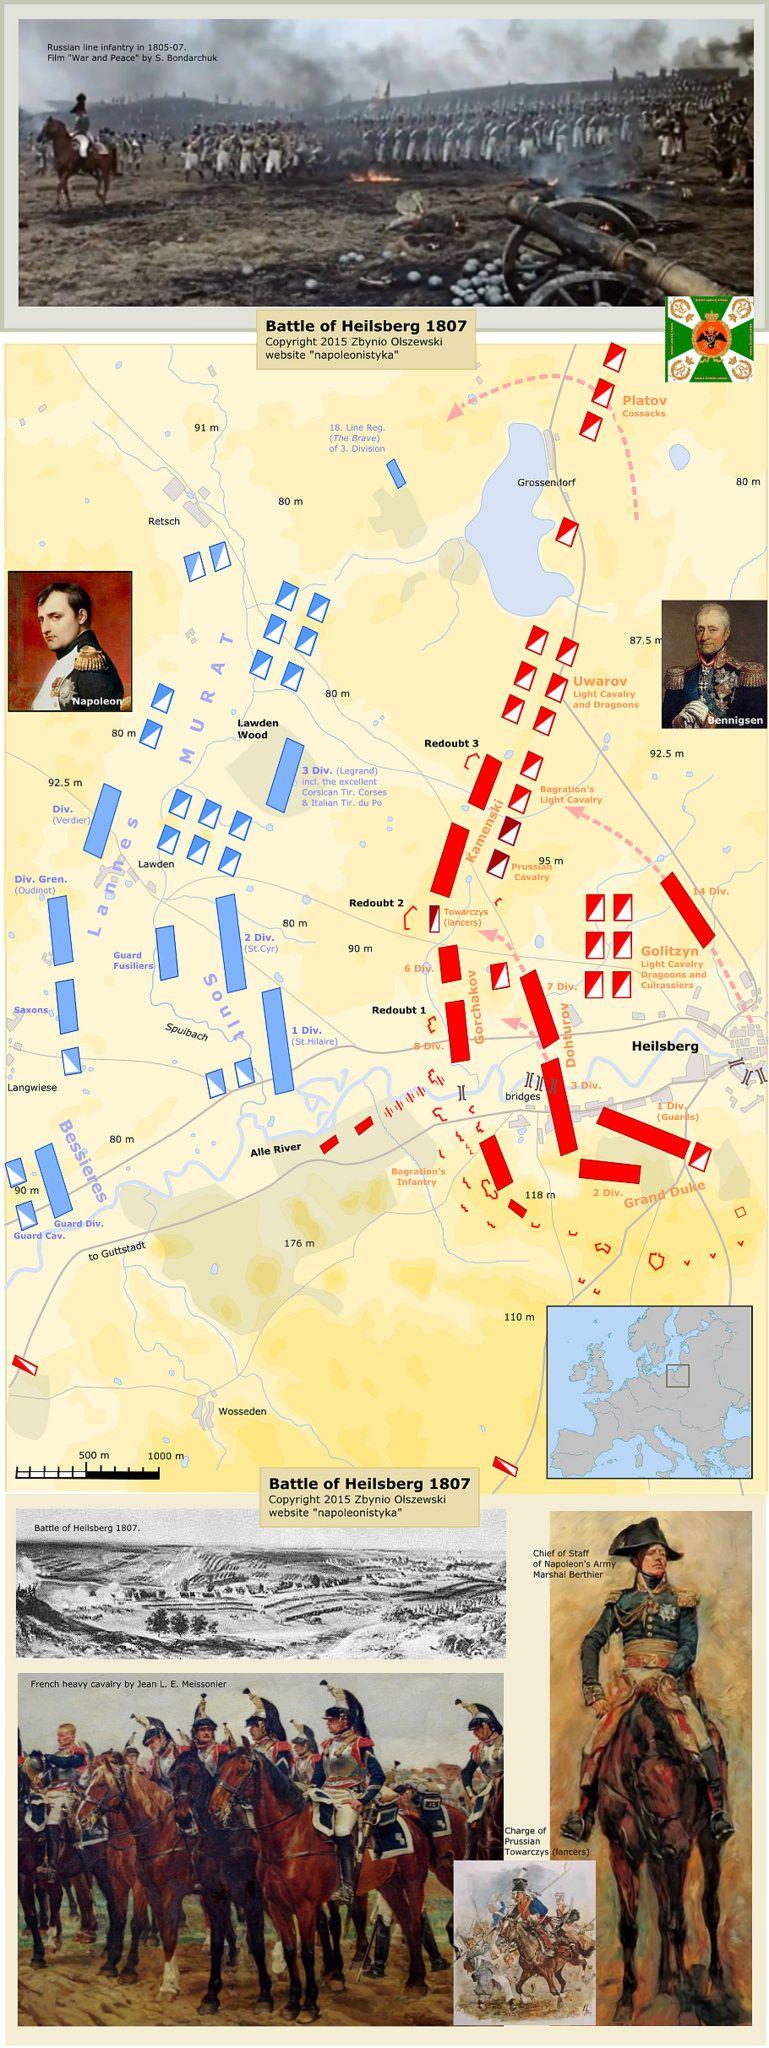 Article and more maps here mapswar2x10hostcomBattleofHeilsberg1807htm